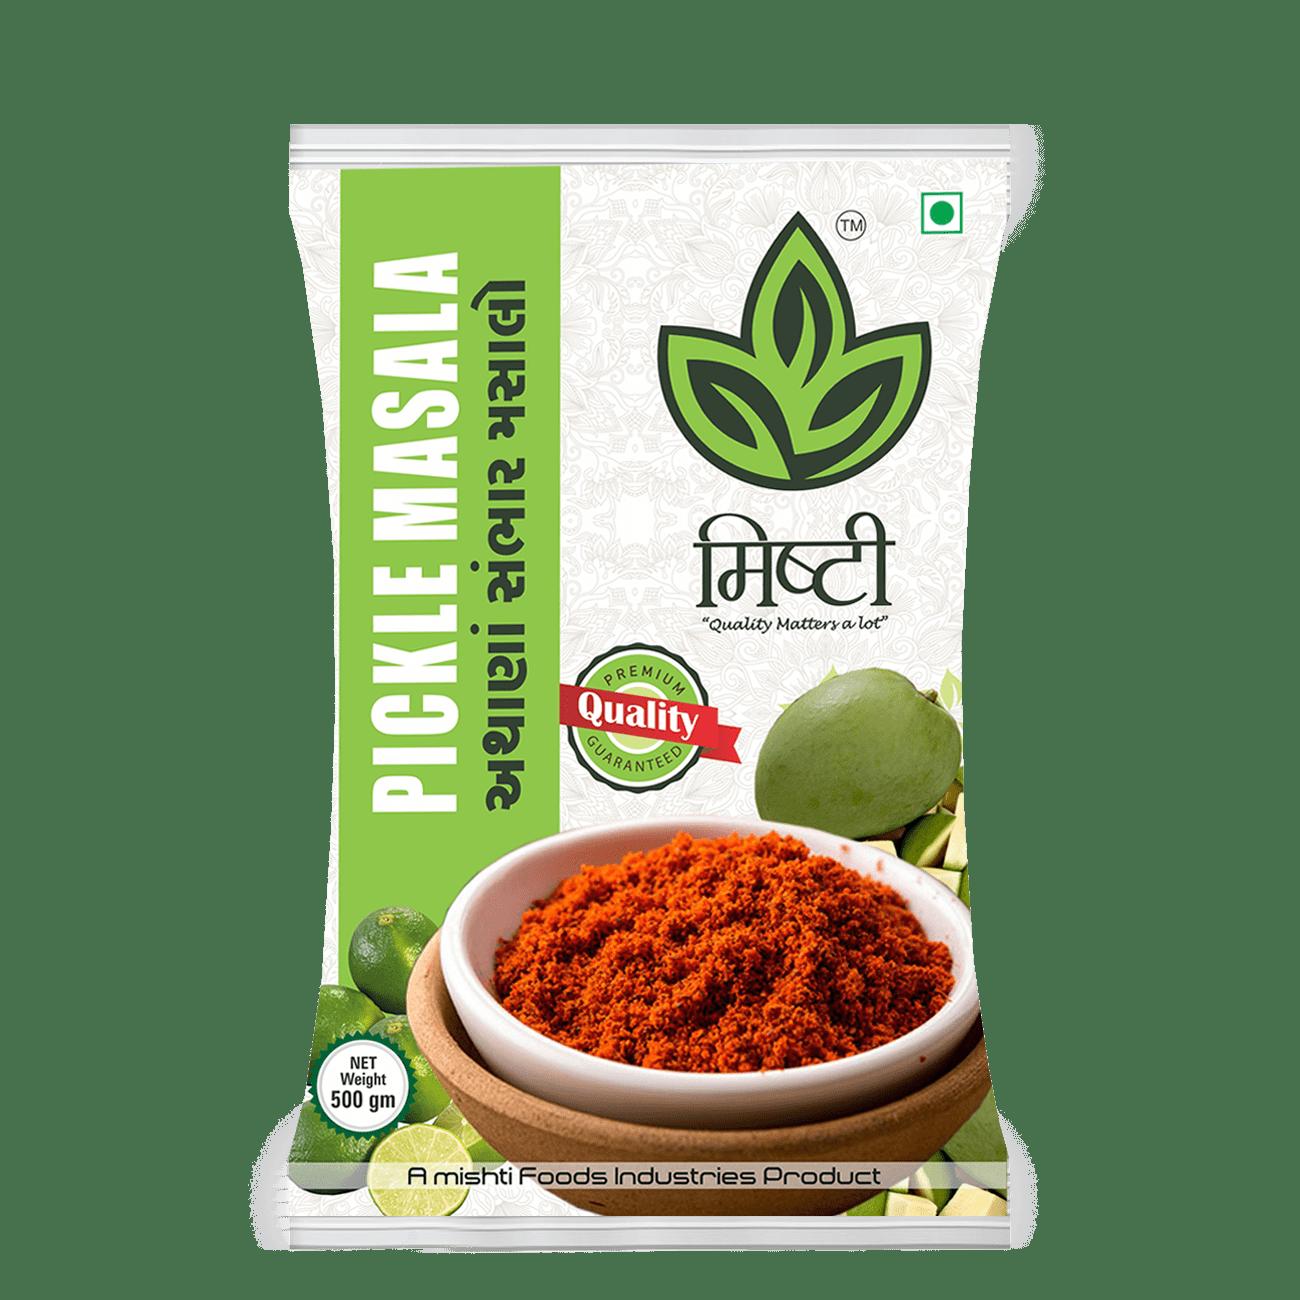 Mishti Foods Industries Photos, Sama, Vadodara- Pictures & Images